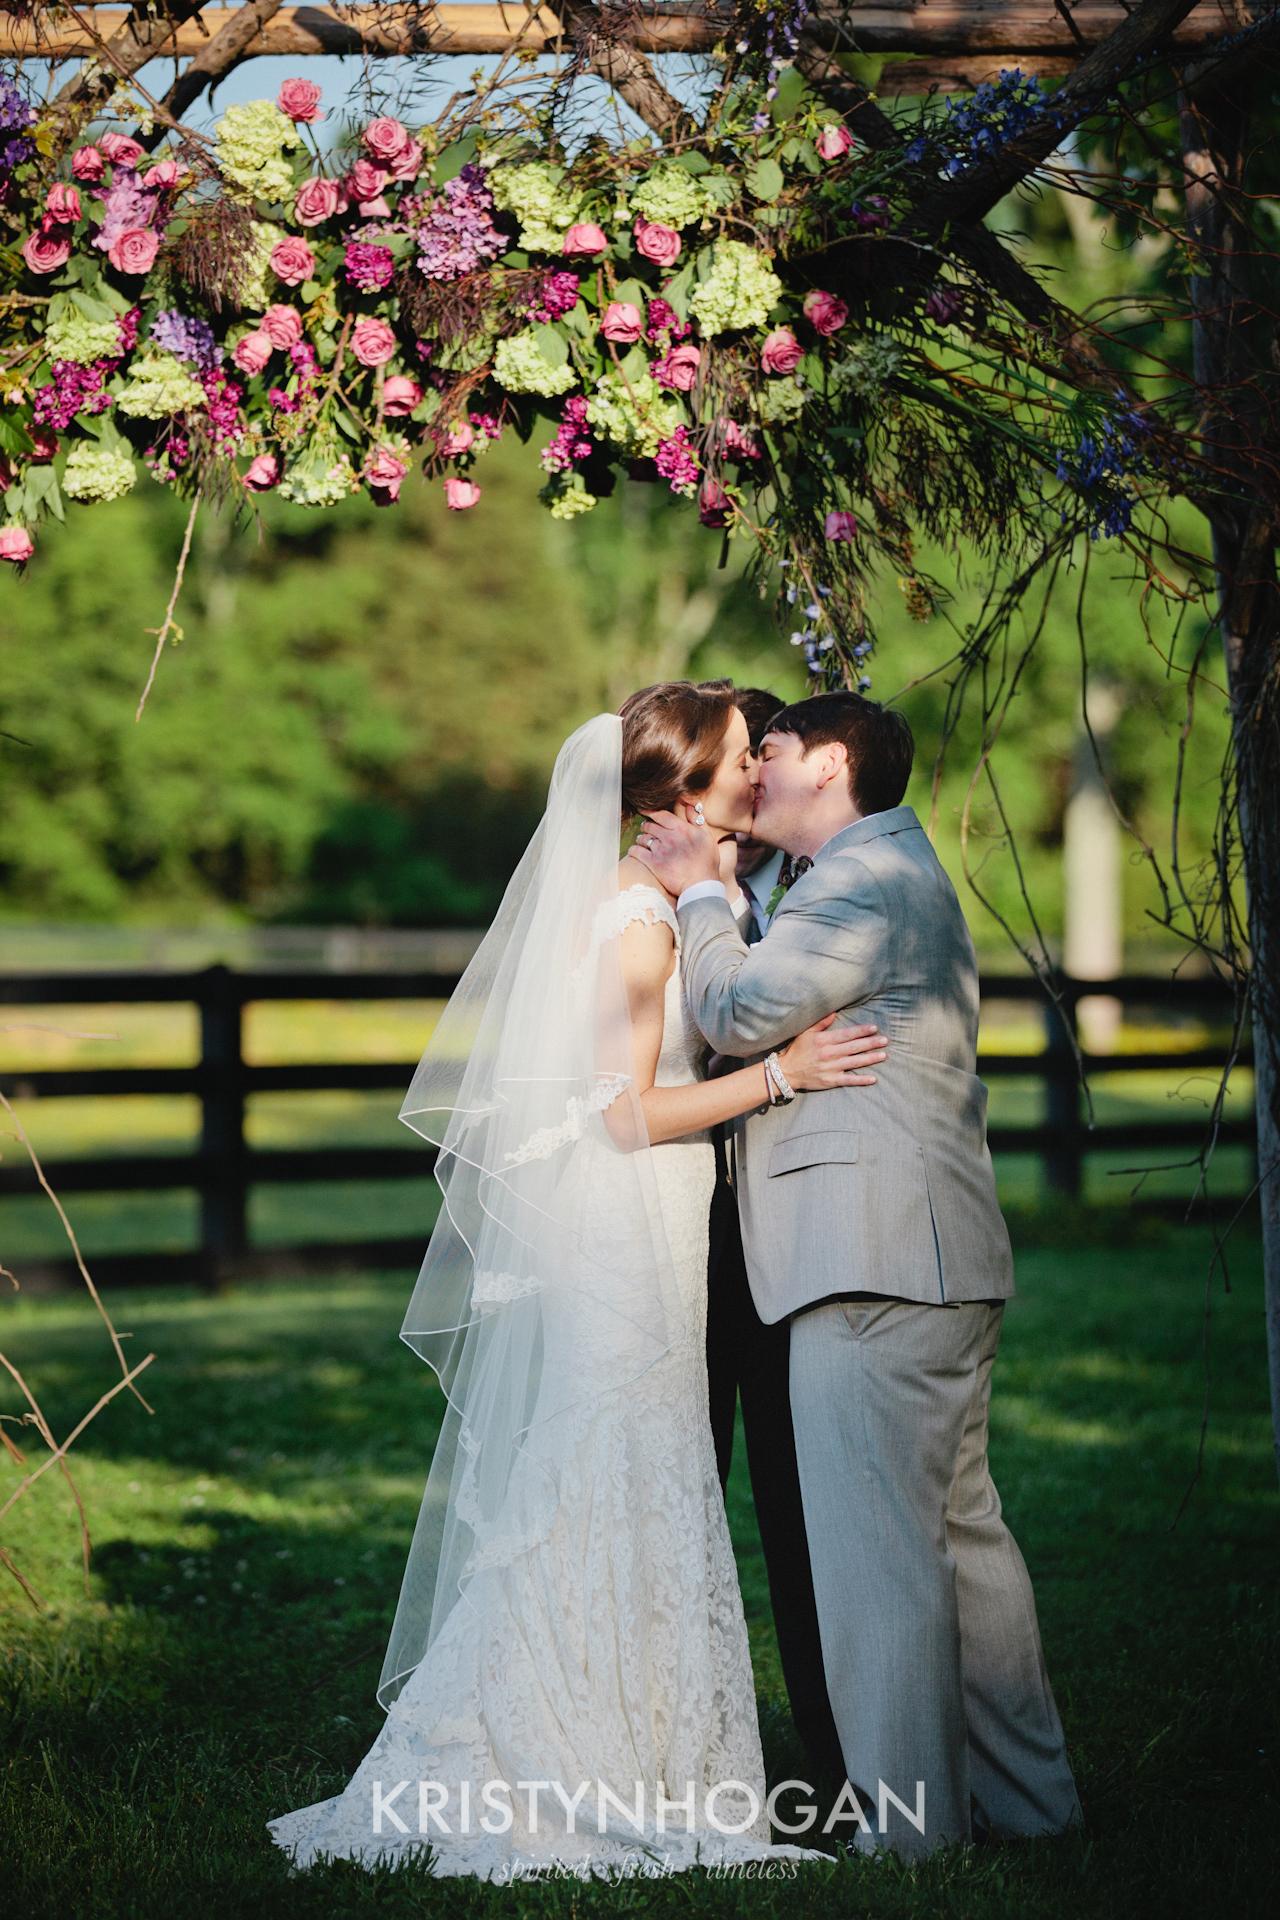 Nashville_Wedding_Photographer_Kristyn_Hogan_Samples_309.jpg